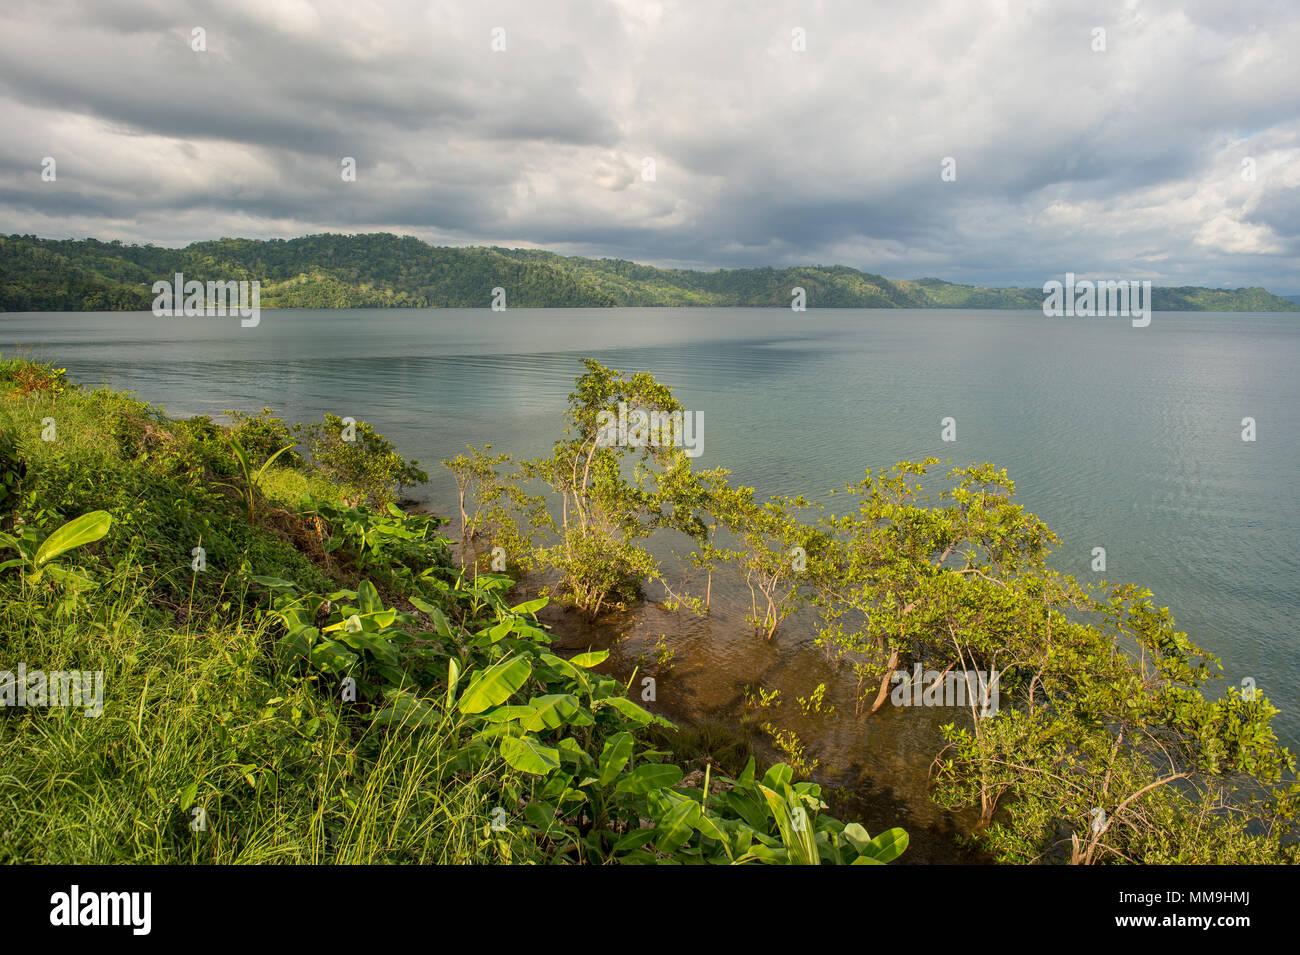 Golfo Dulce, Costa Rica, Osa Peninsula, Centroamerica - Stock Image